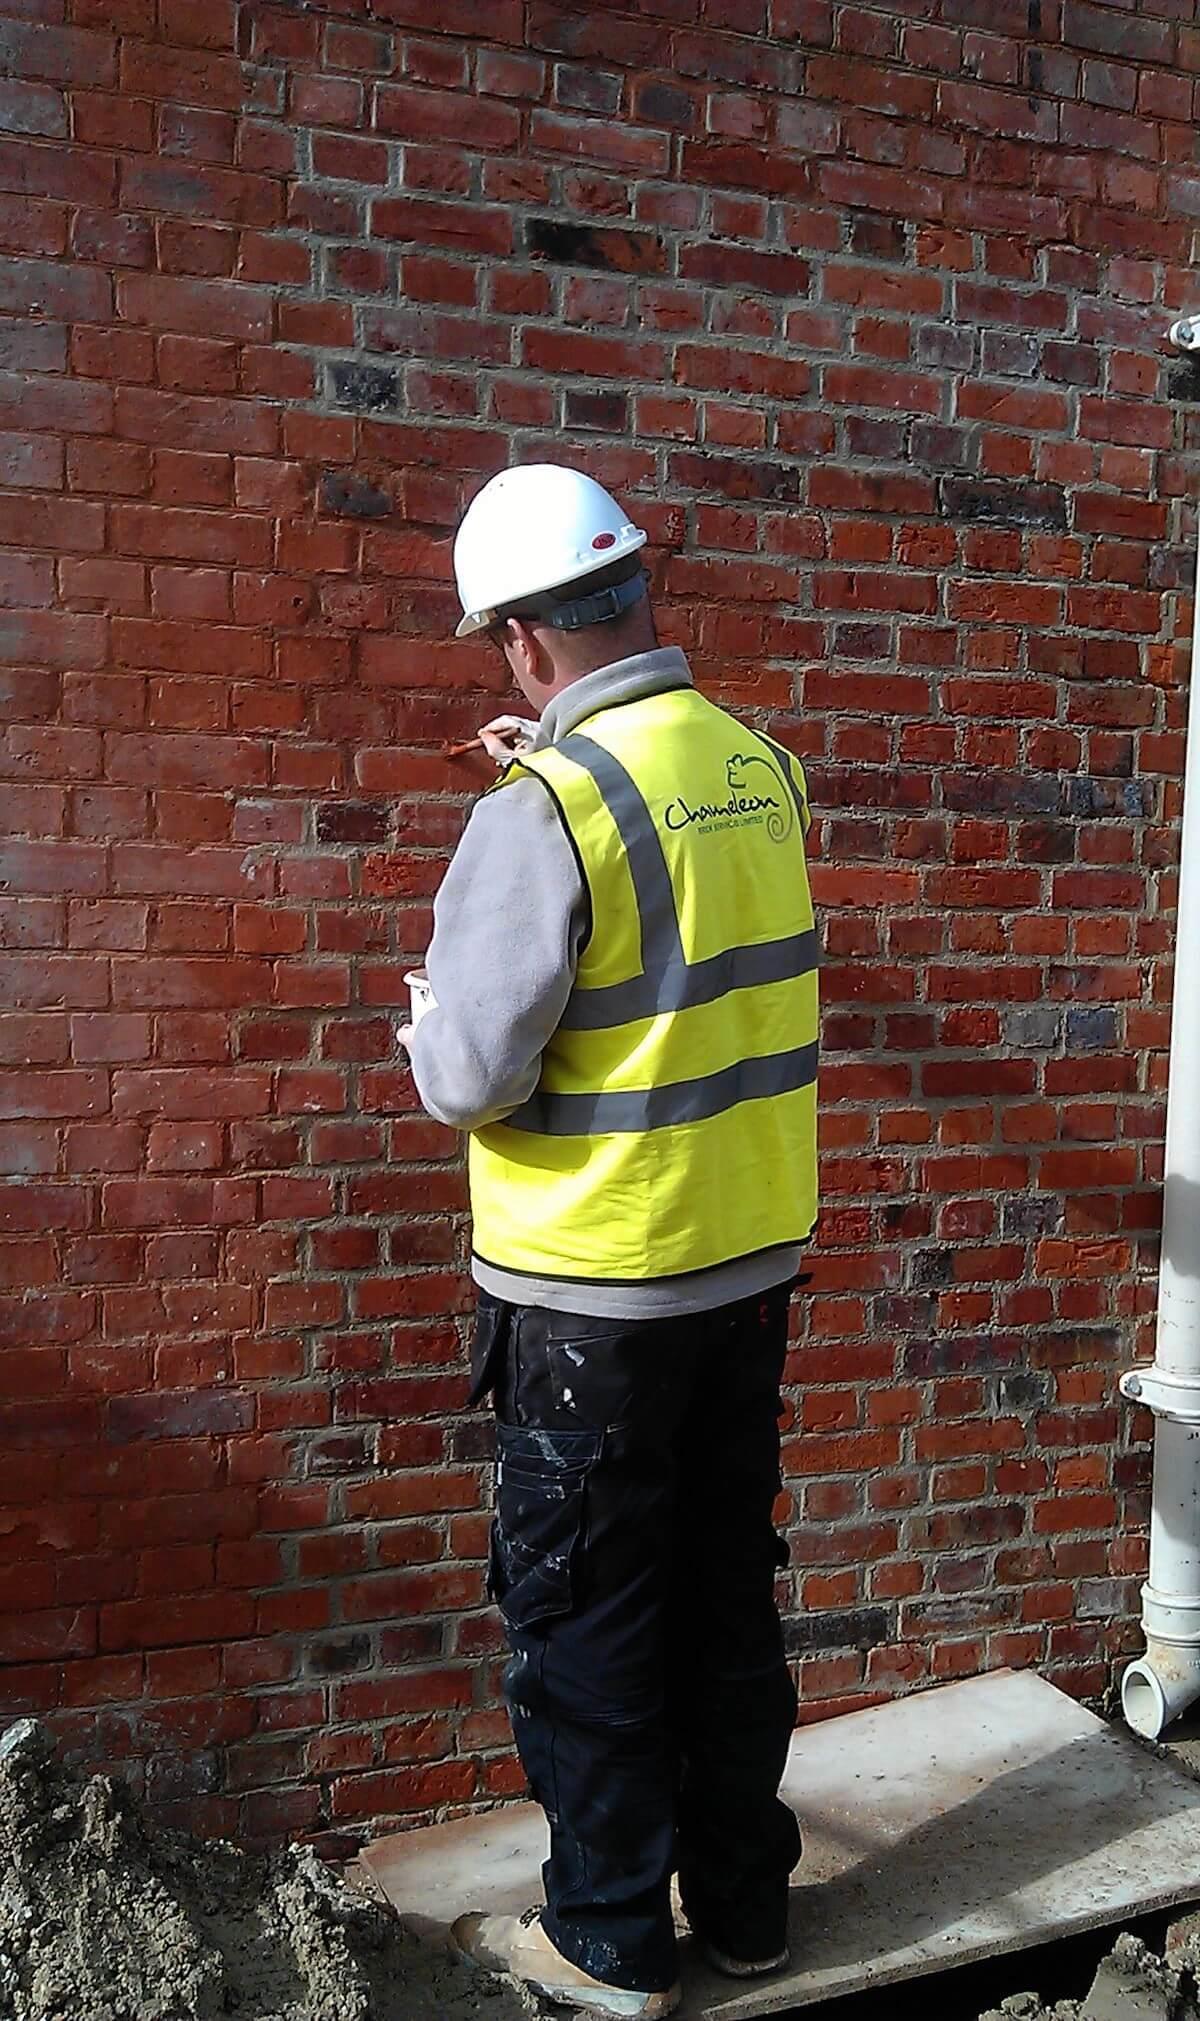 Chameleon Brick Tinting Work in Progress Brick Dyeing Southampton South England